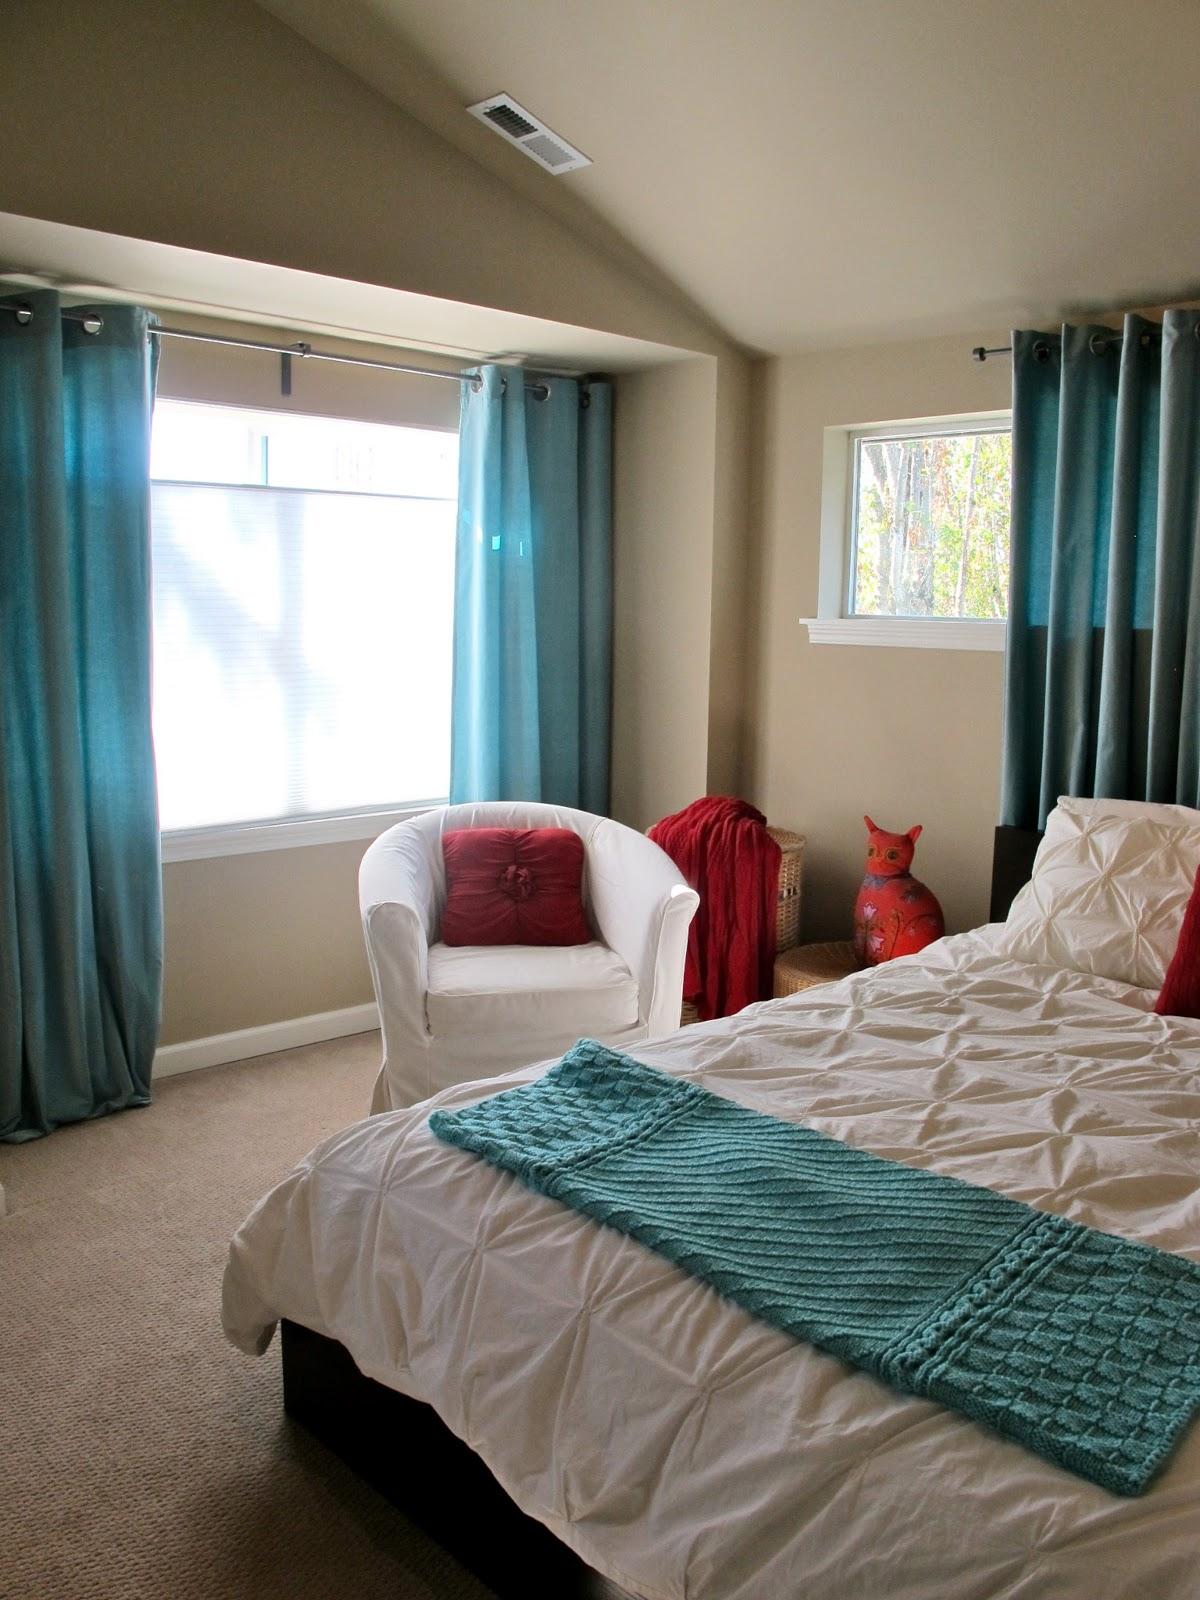 BluKatKraft: Simple Bedroom Makeover: White, Turquoise & Red